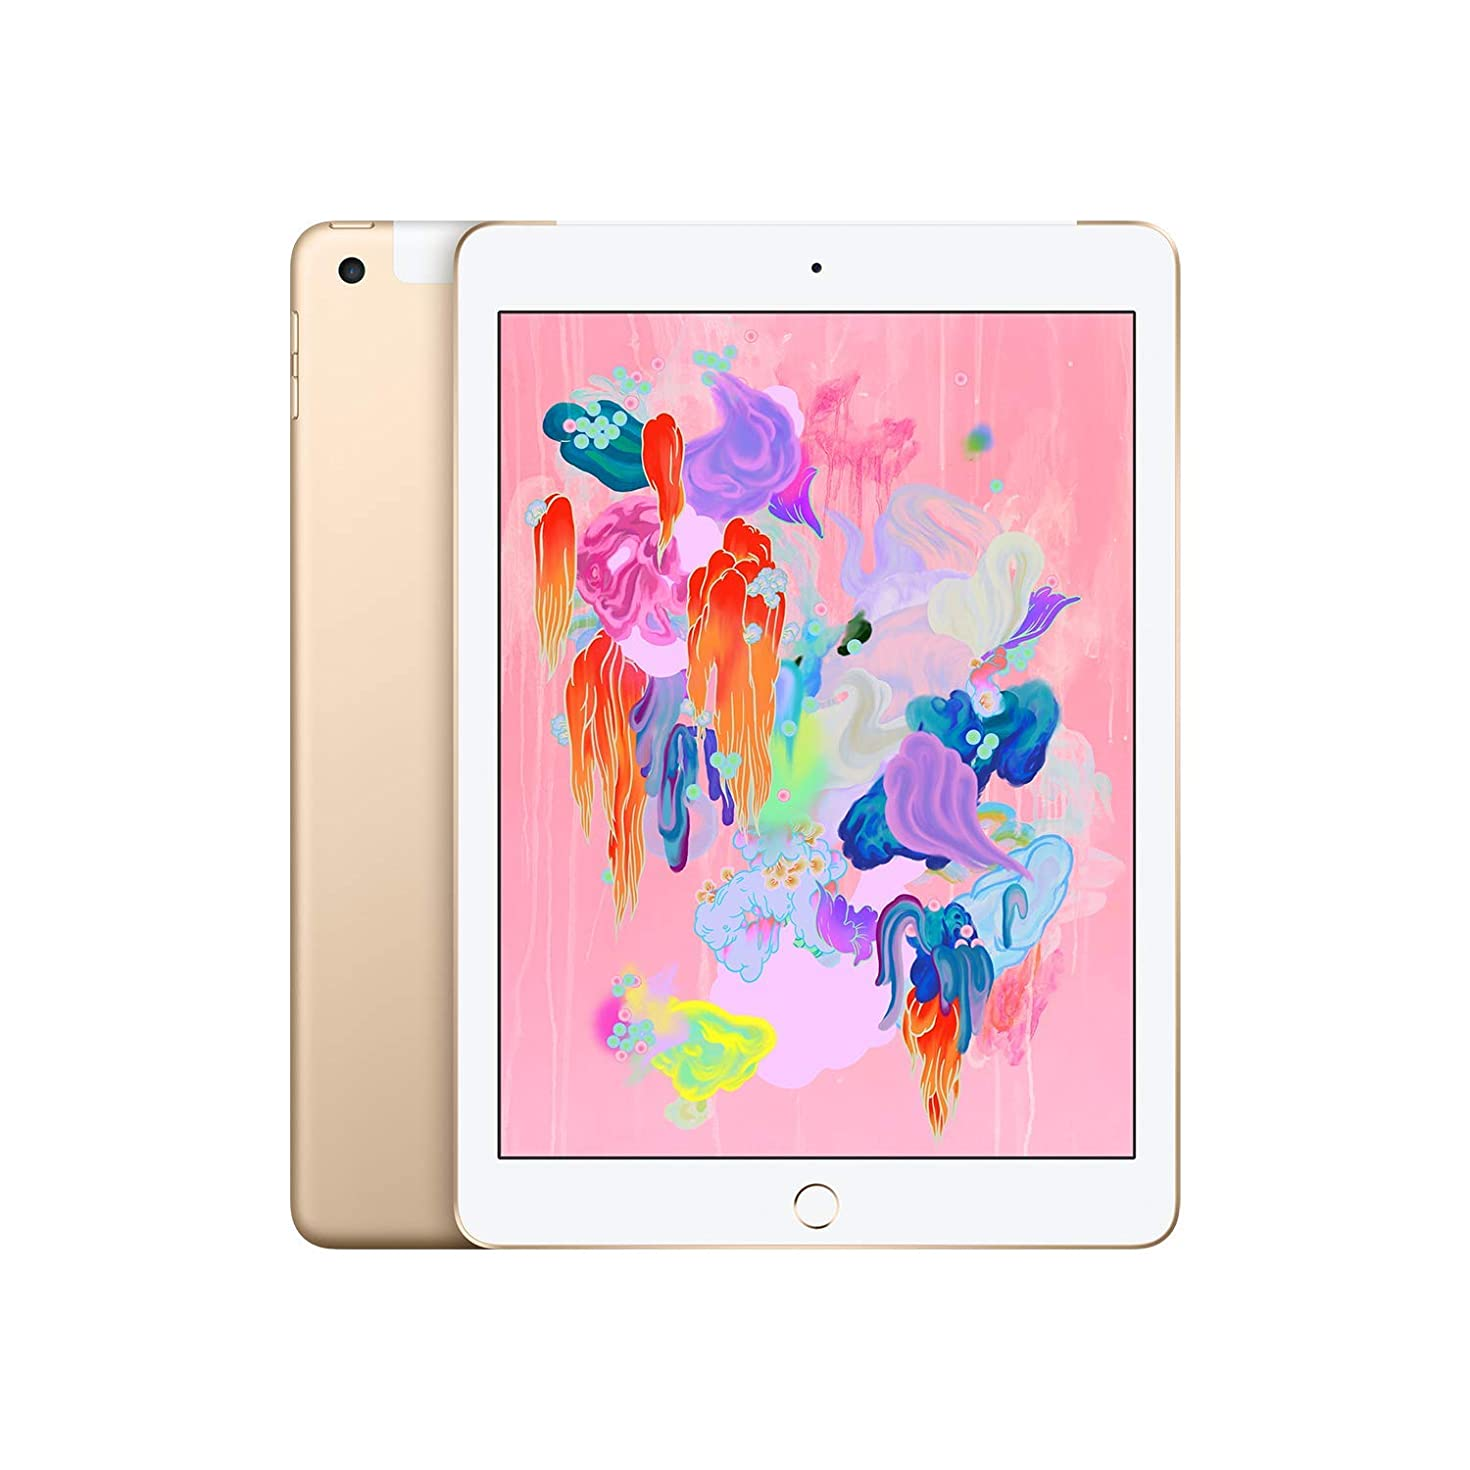 Apple iPad (Wi-Fi + Cellular, 128GB) - Gold (Latest Model)